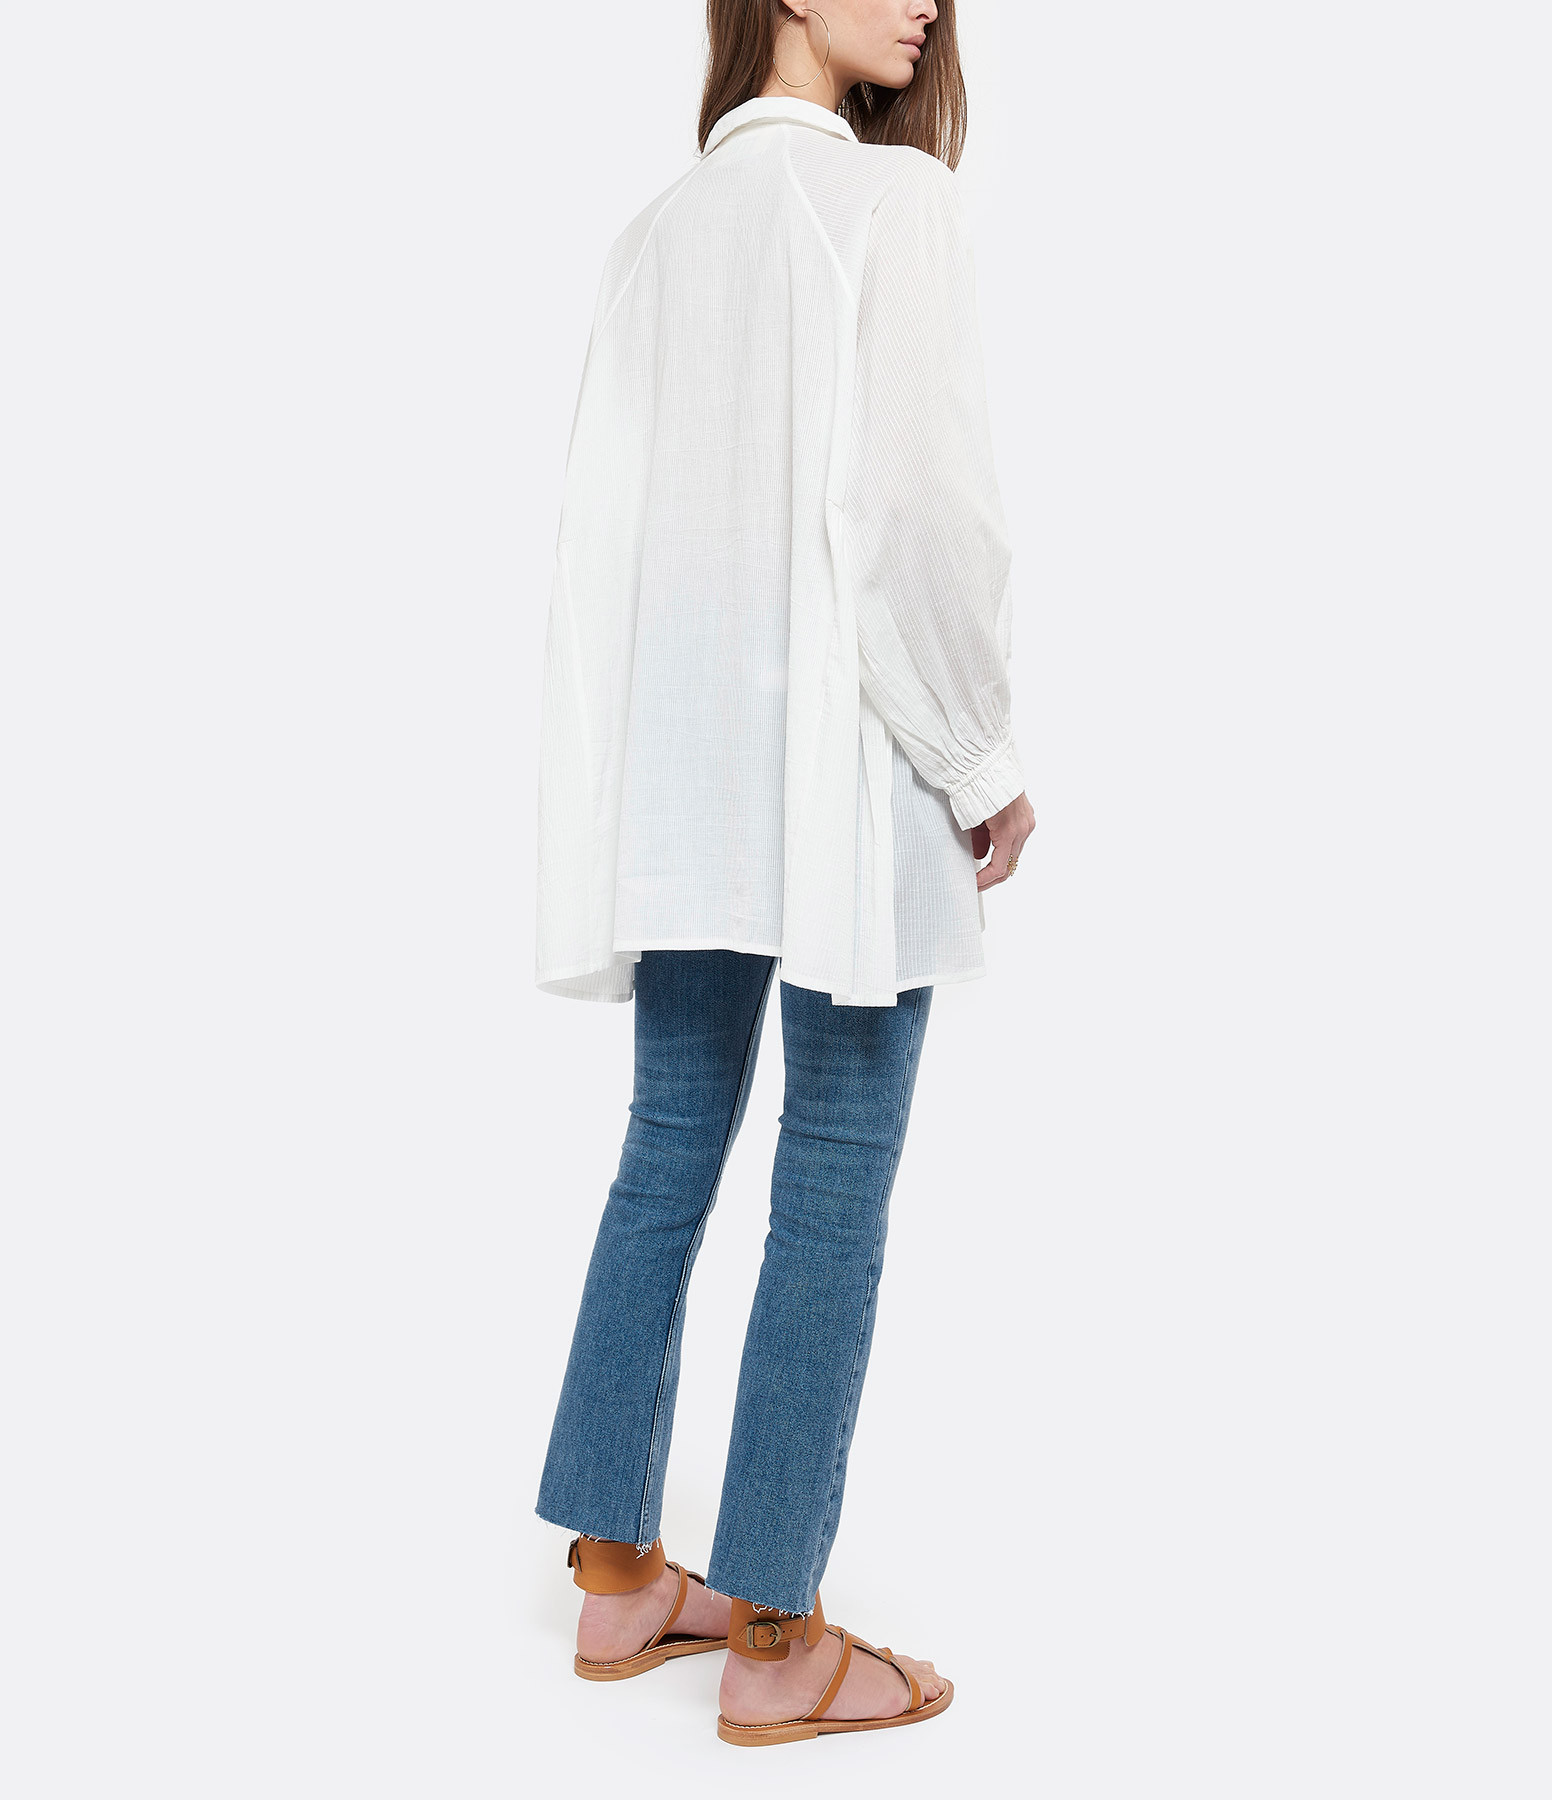 MII - Tunique Unie Coton Blanc